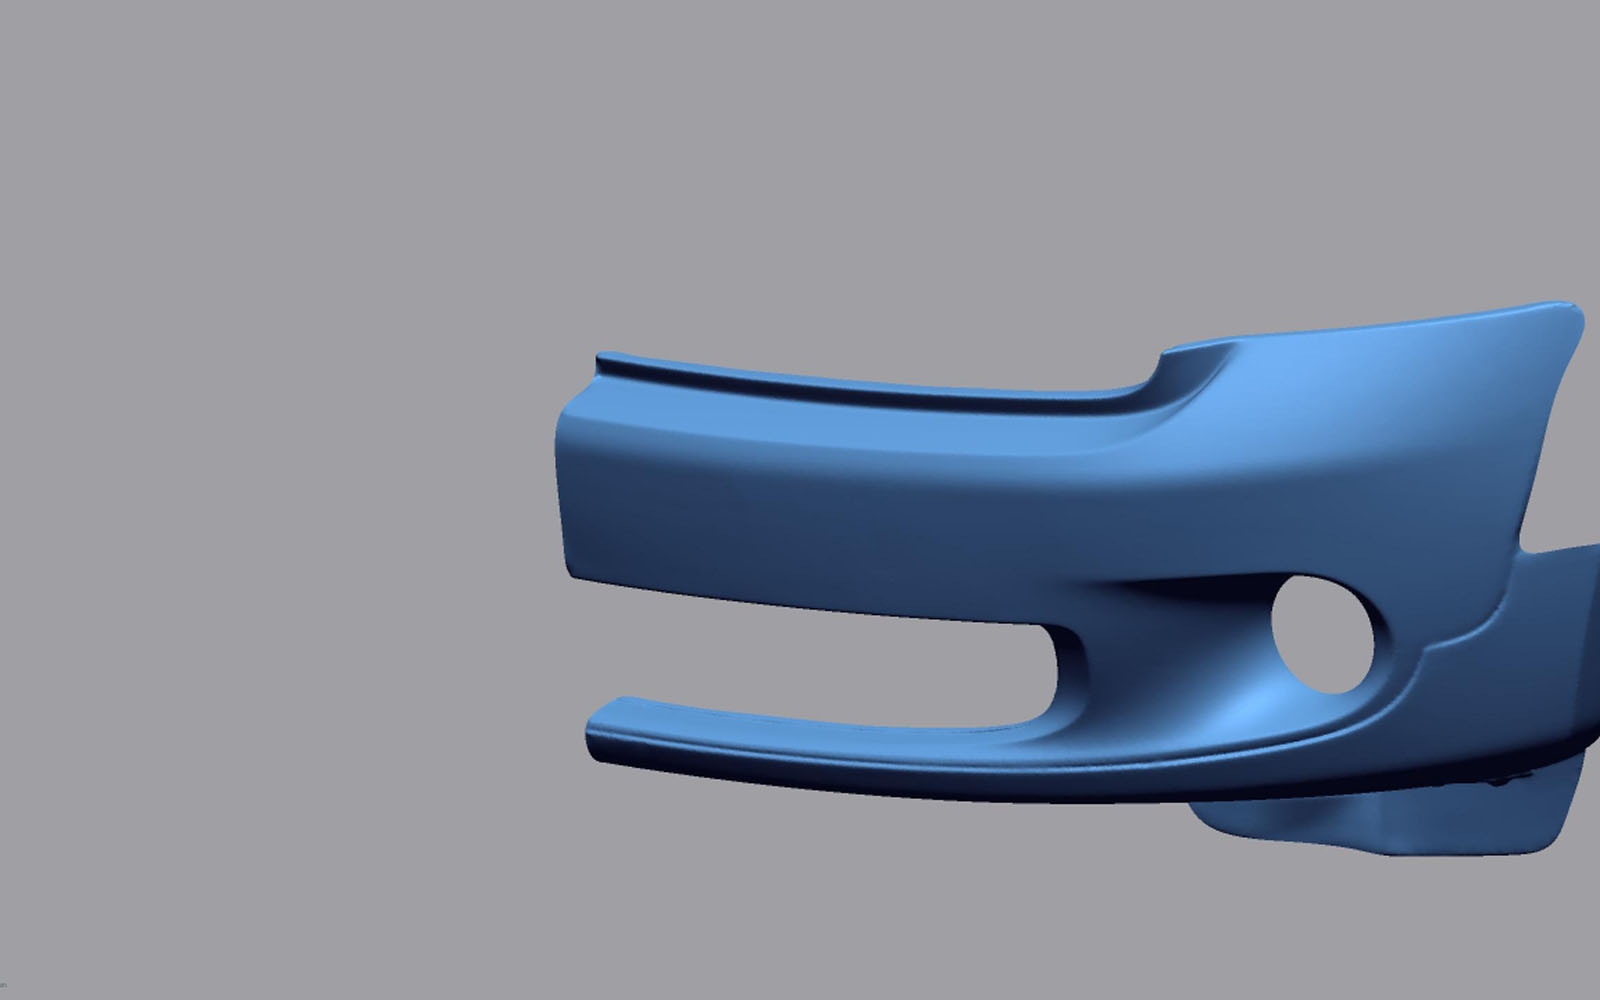 Conap 3D Reverse Engineering - Polygonflächenmodell eine Stoßfängerverkleidung